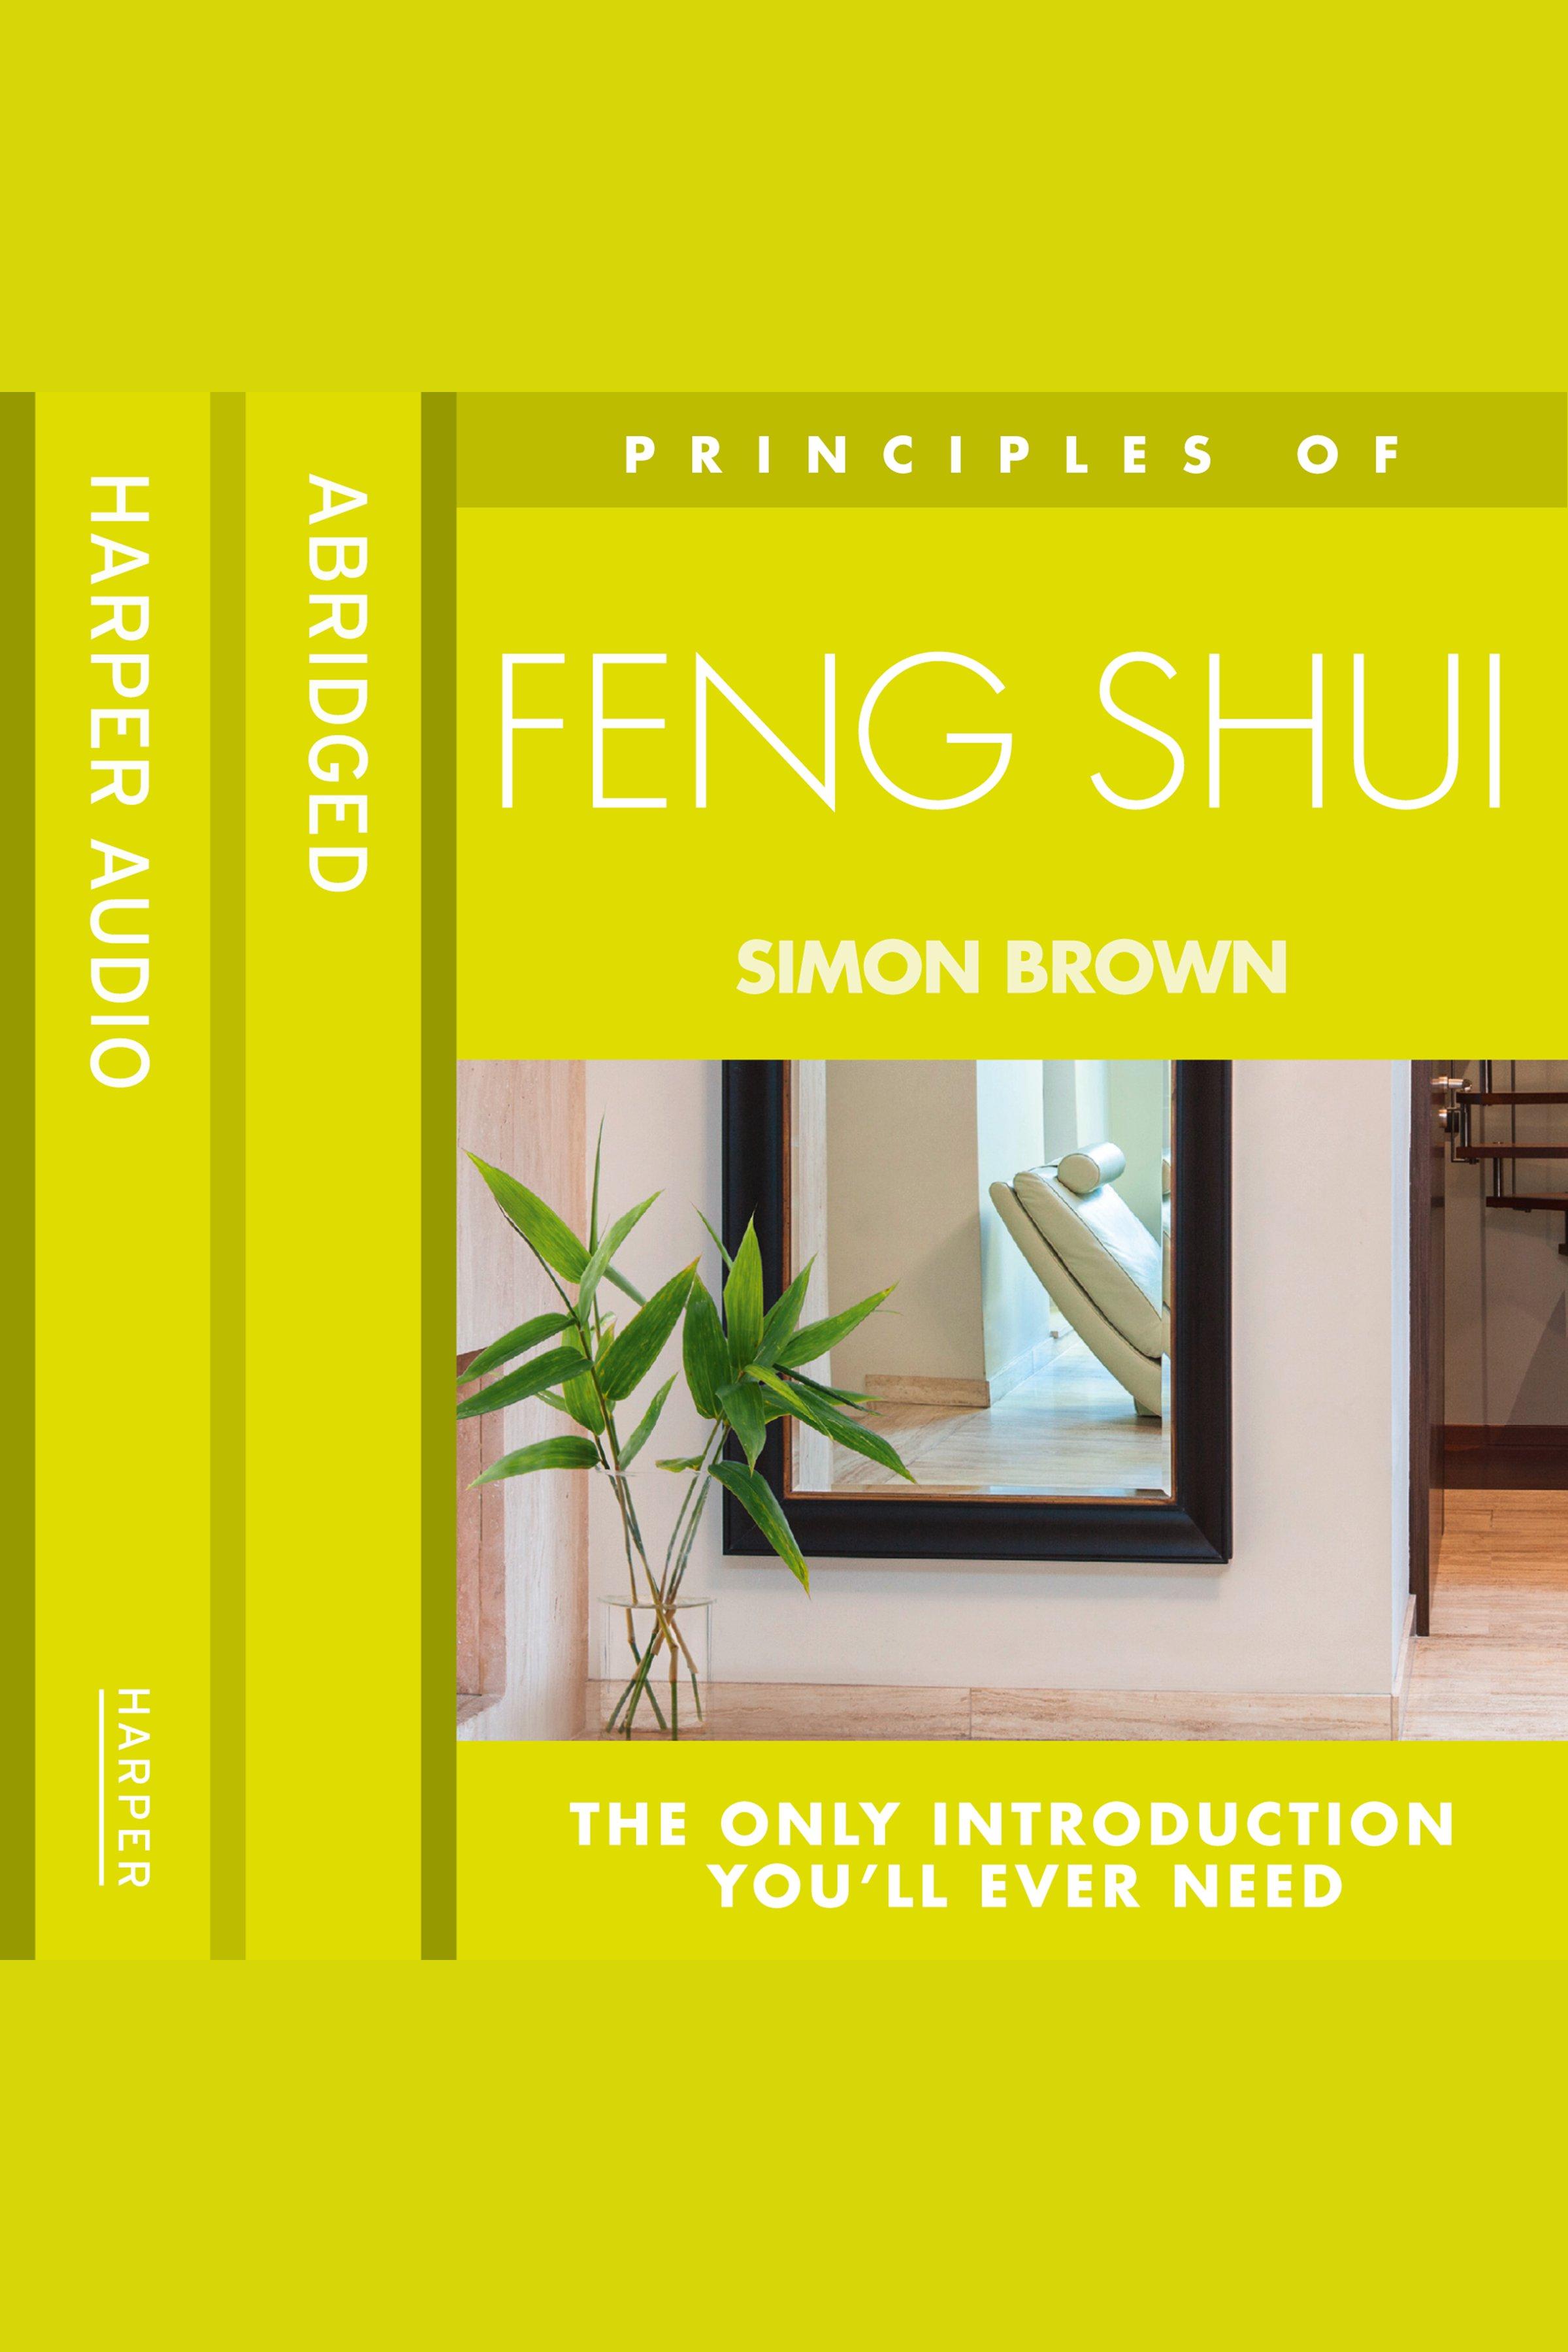 Esta es la portada del audiolibro Principles of Feng Shui: The Only Introduction You'll Ever Need